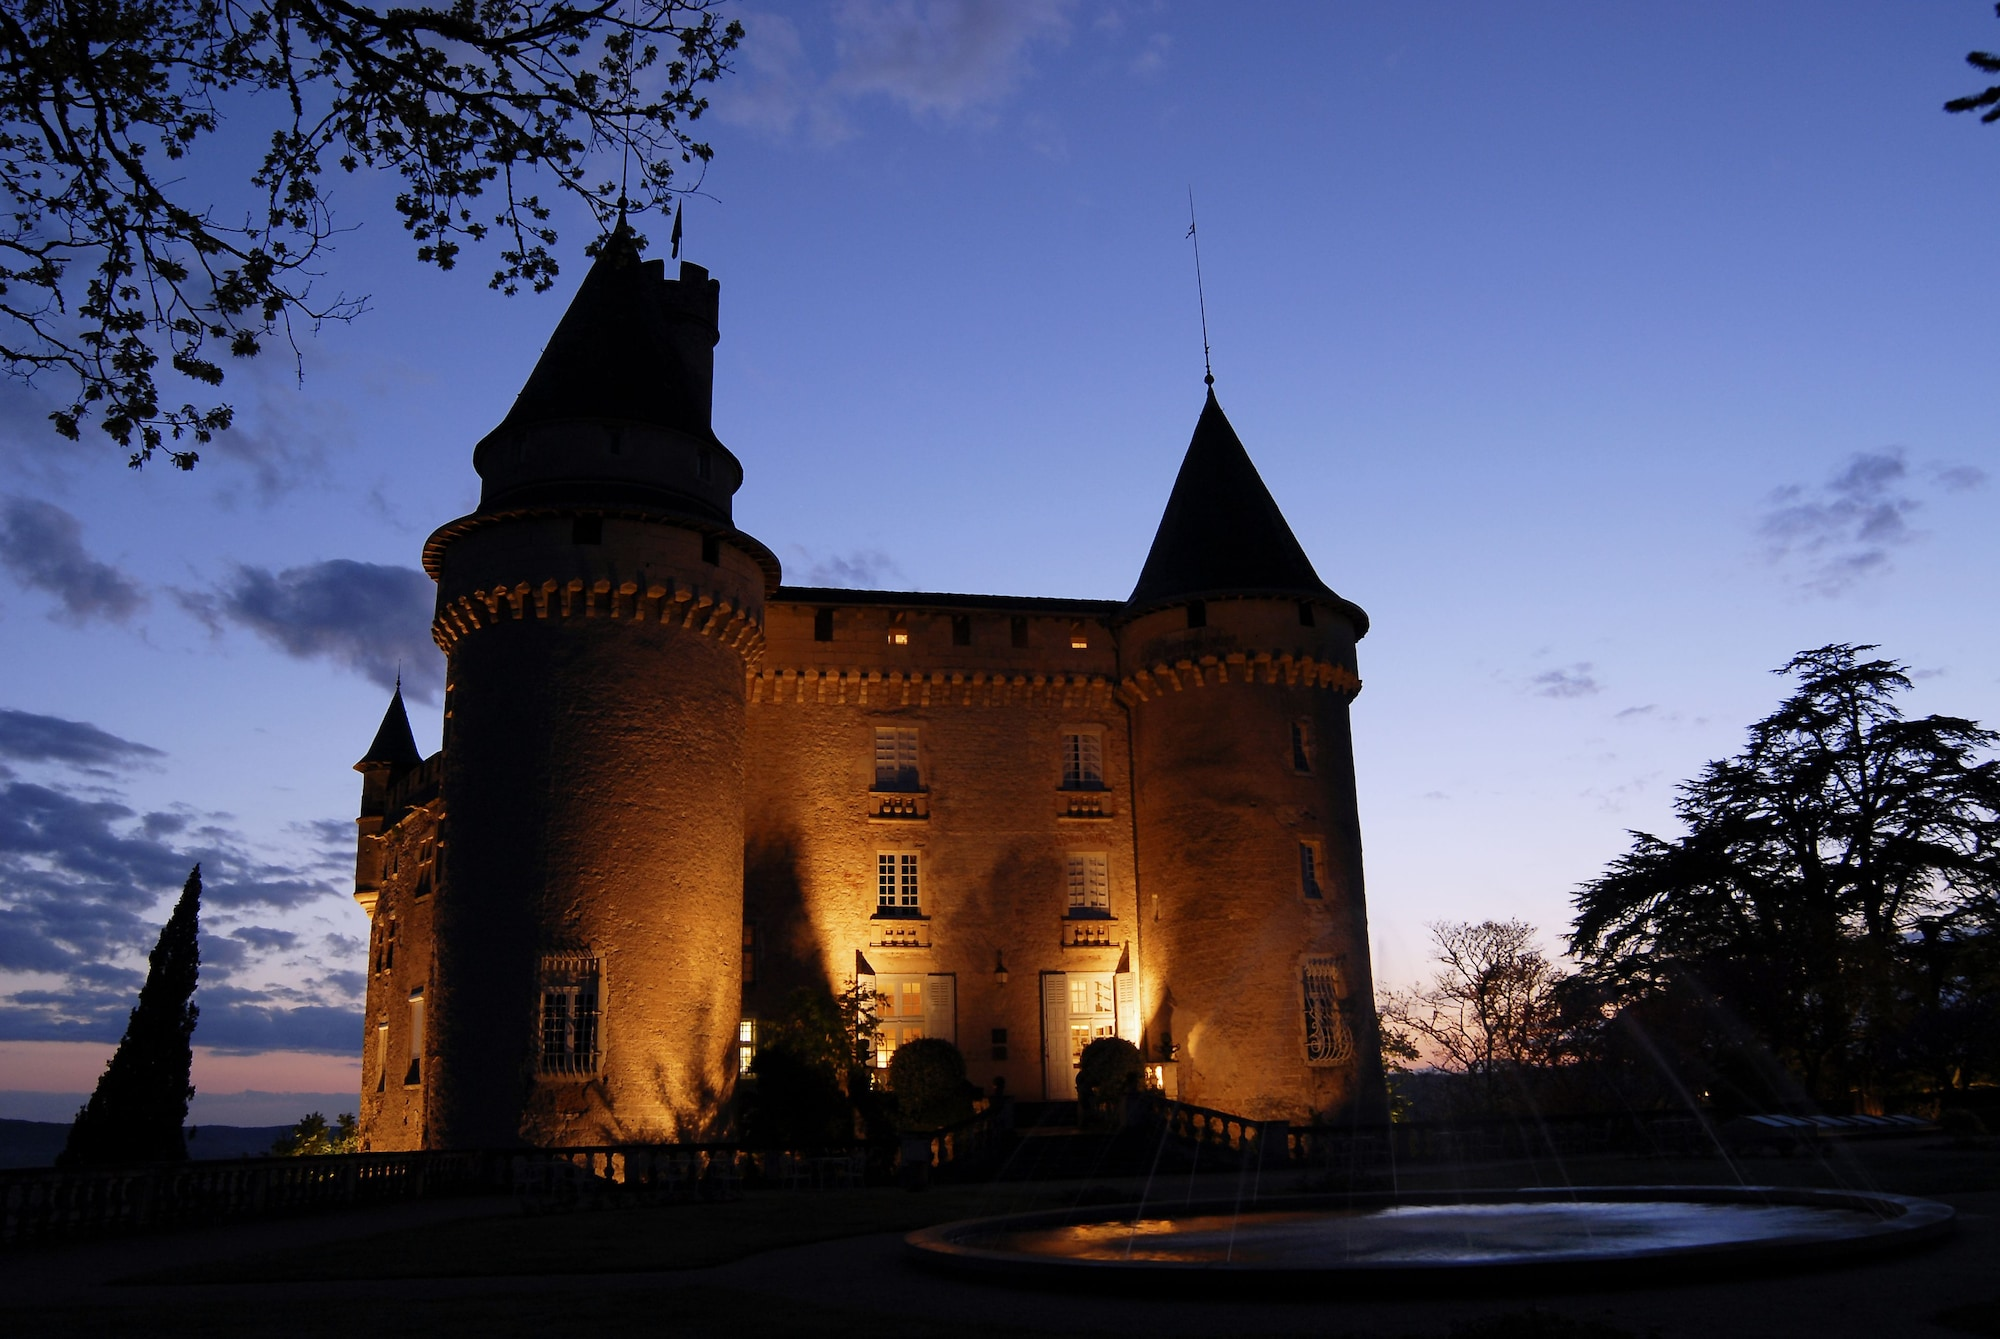 Château de Mercuès, Lot